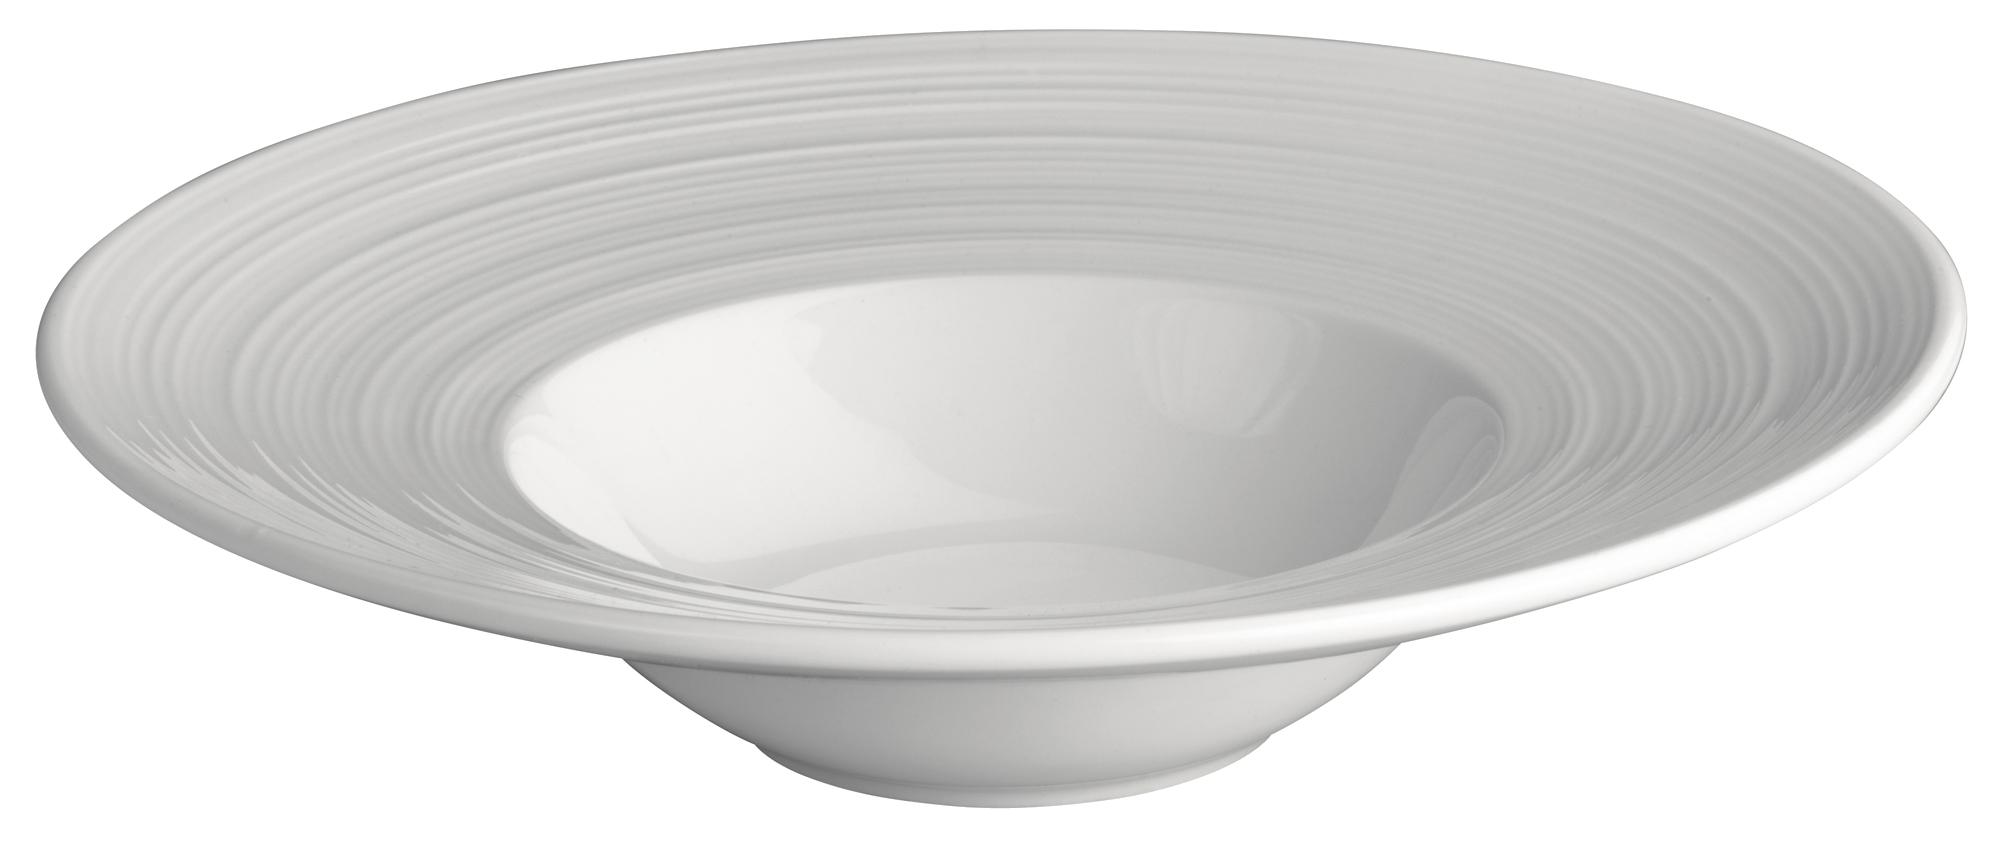 Winco WDP022-103 china, bowl,  9 - 16 oz